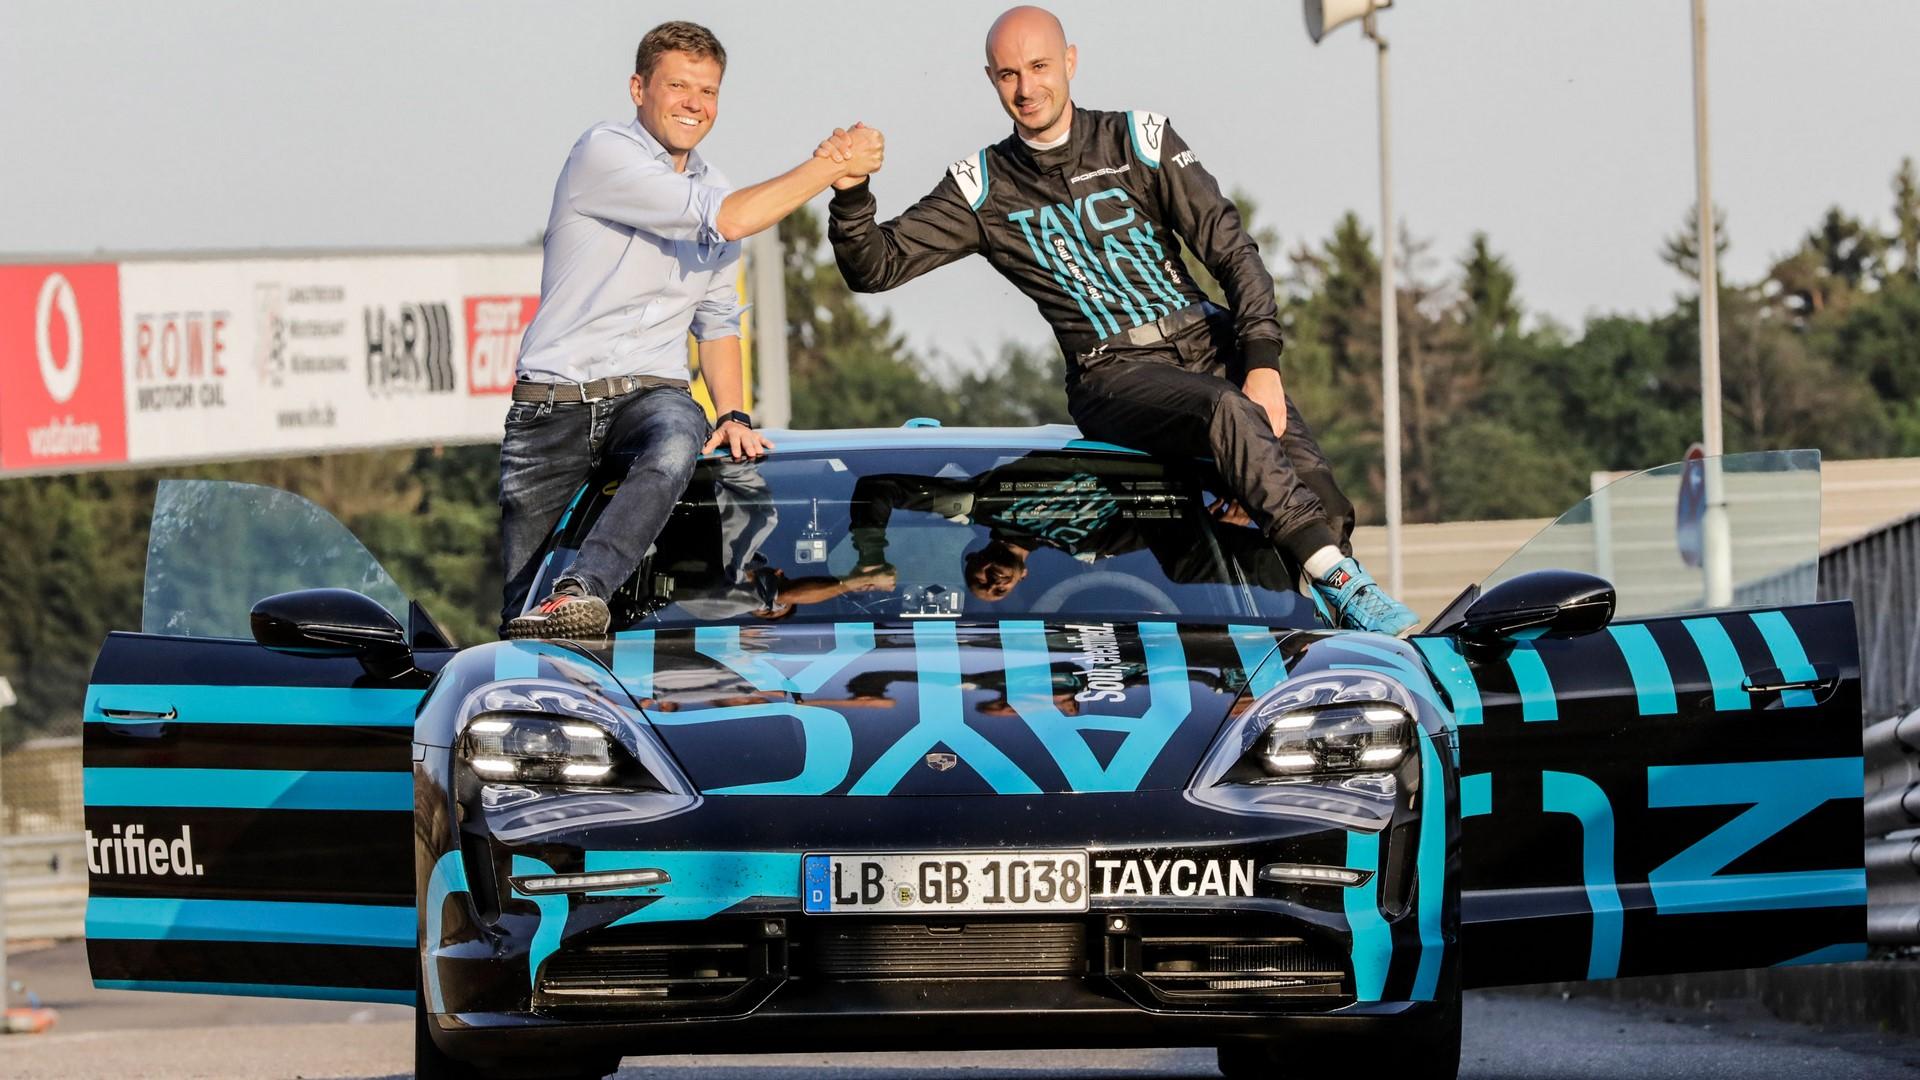 Porsche-Taycan-Nurburgring-record-12